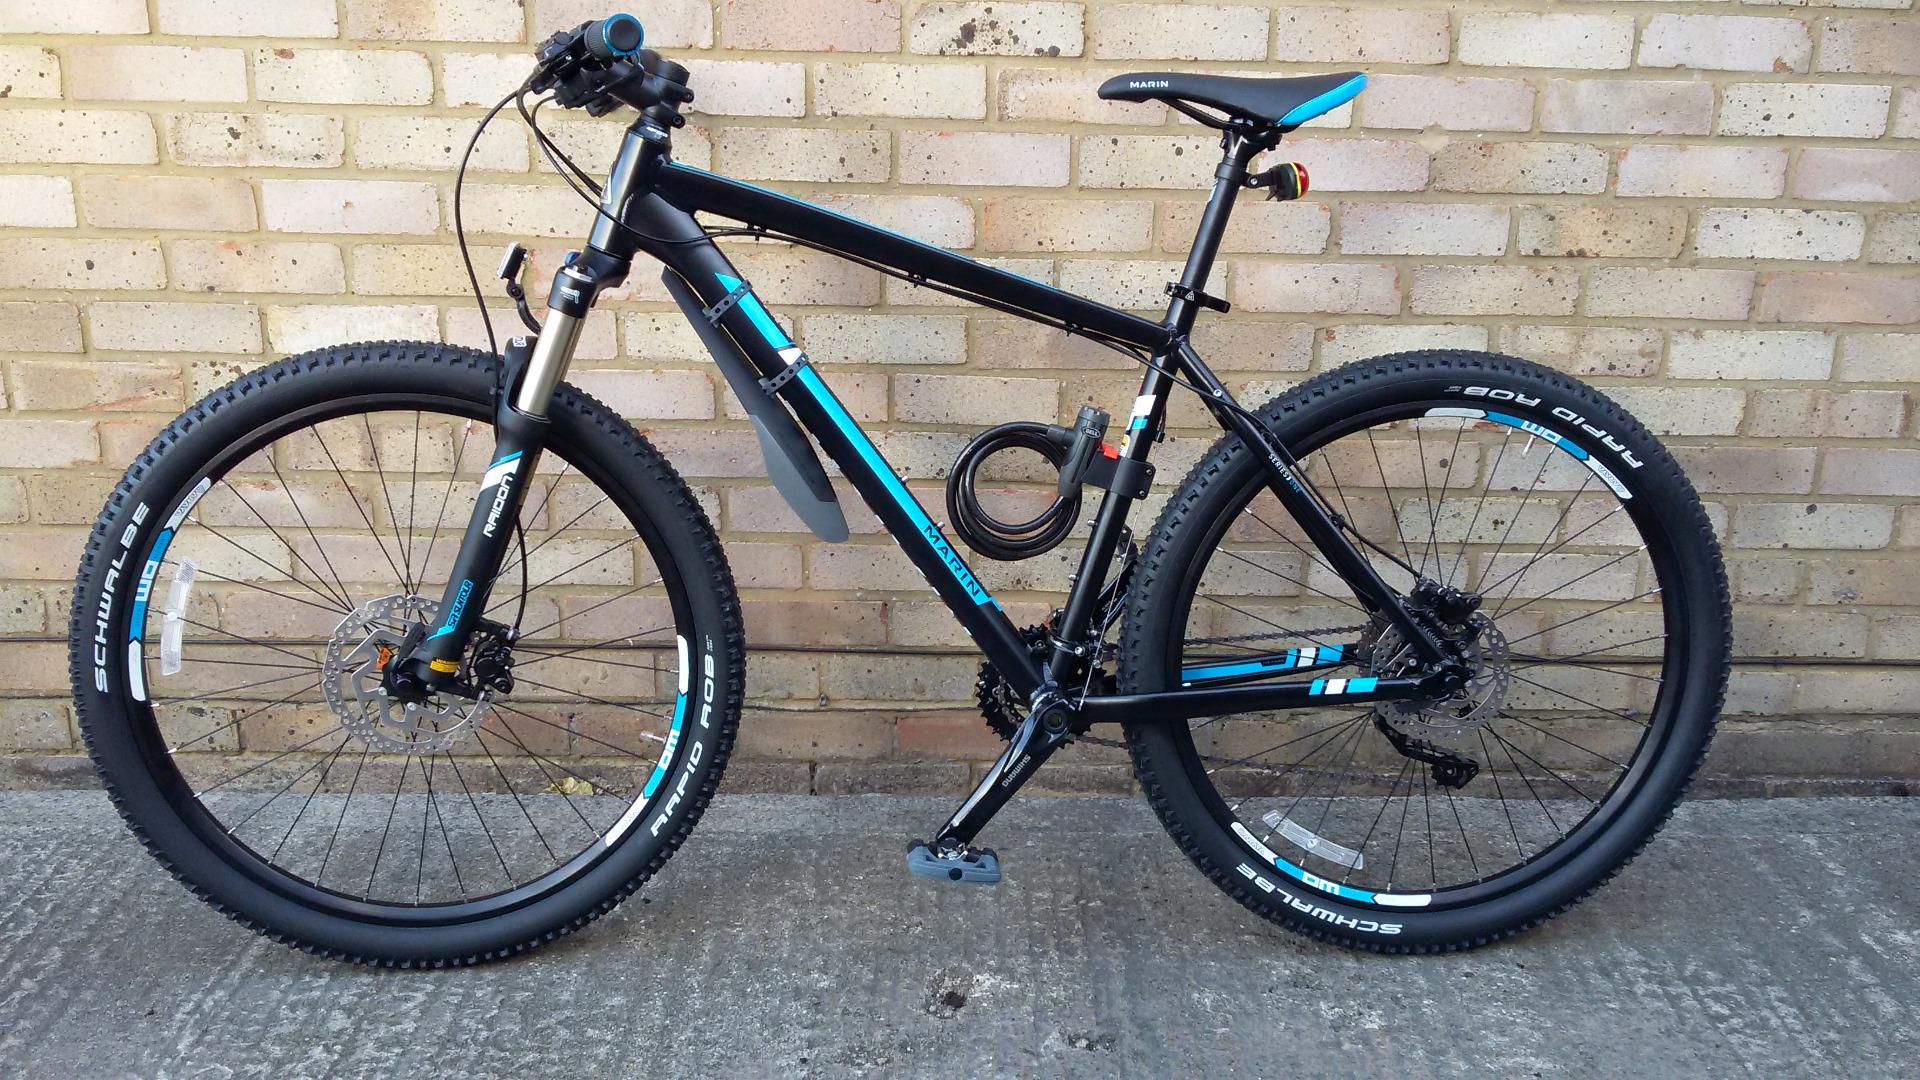 Stolen Marin Bikes Bobcat Trail 7 5 2015